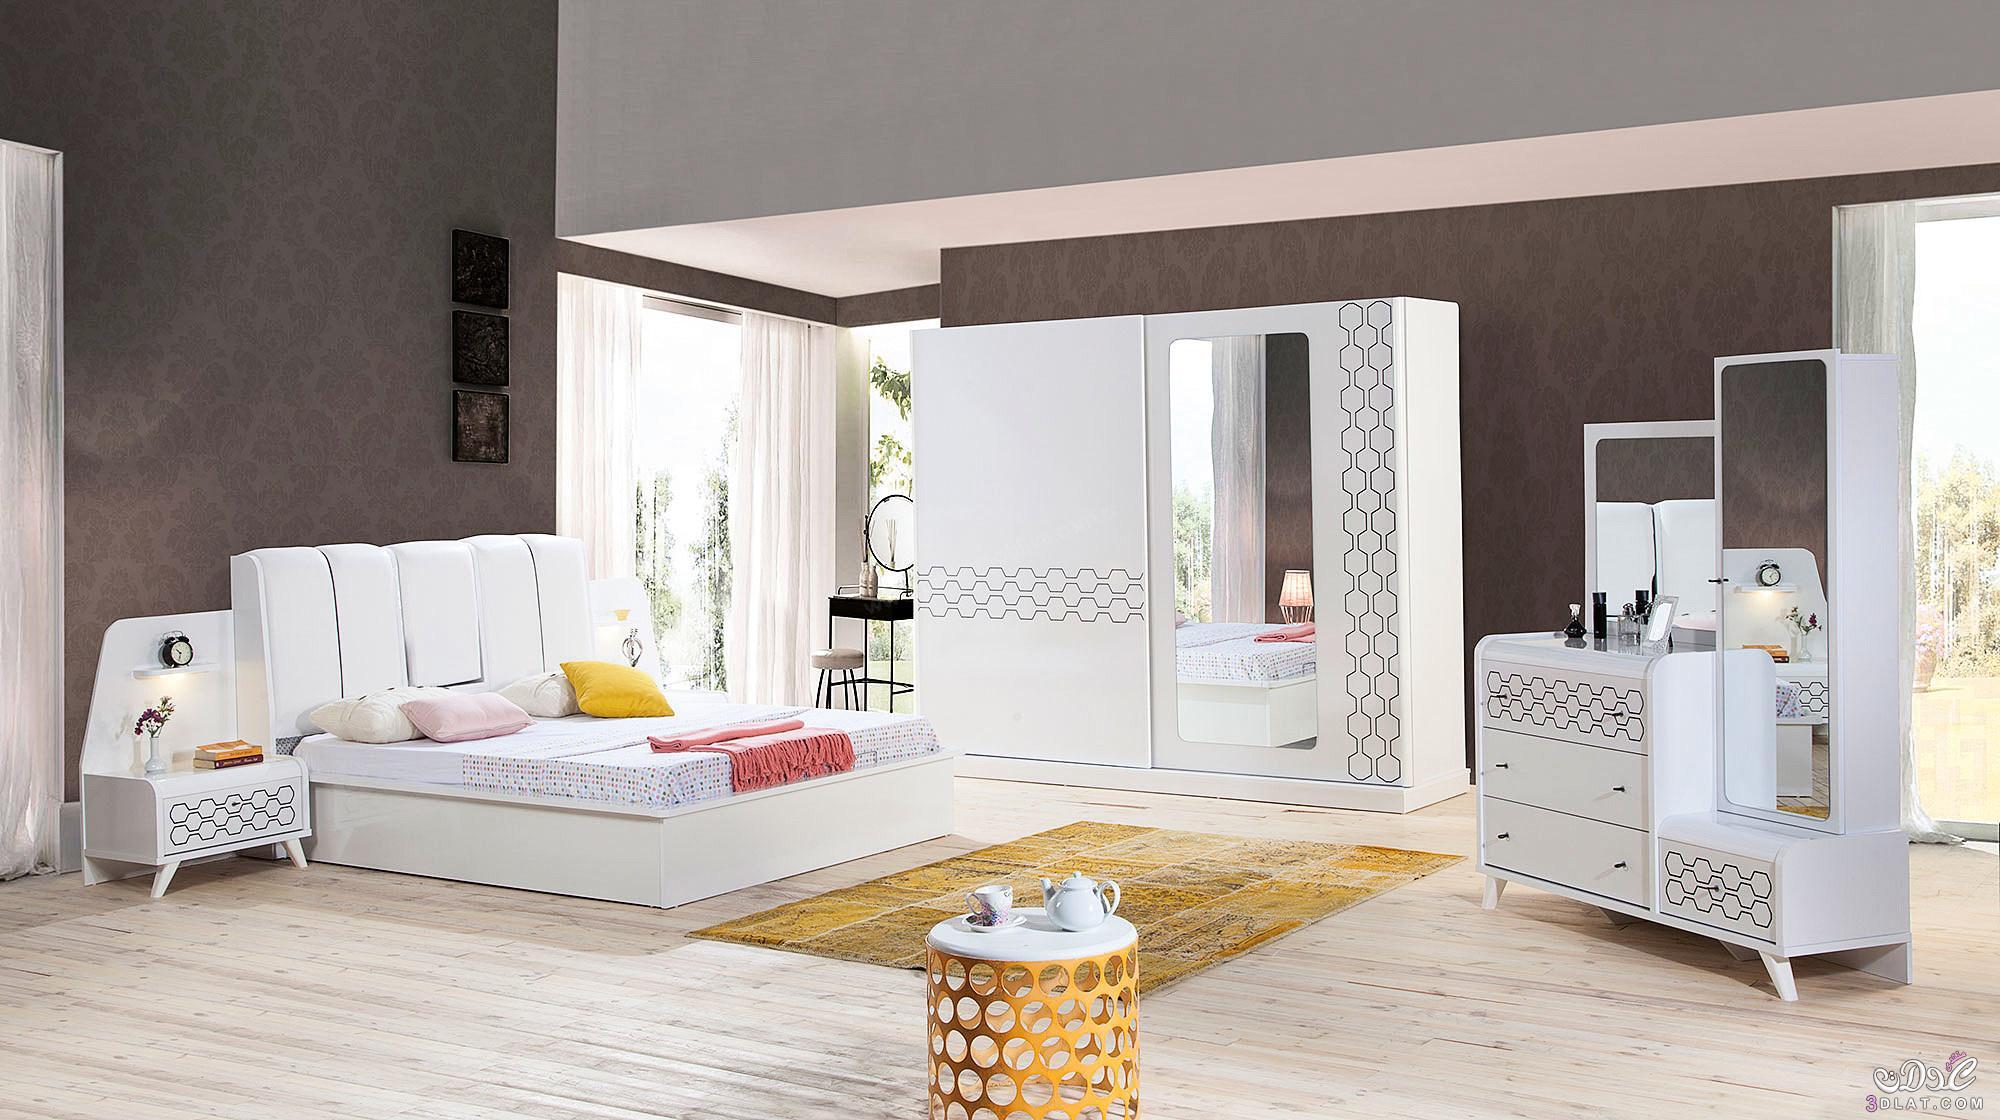 7bb47d941 غرف نوم مودرن 2019 كامله , تصميمات لغرف شباب وعرائس حديثة - كلام حب